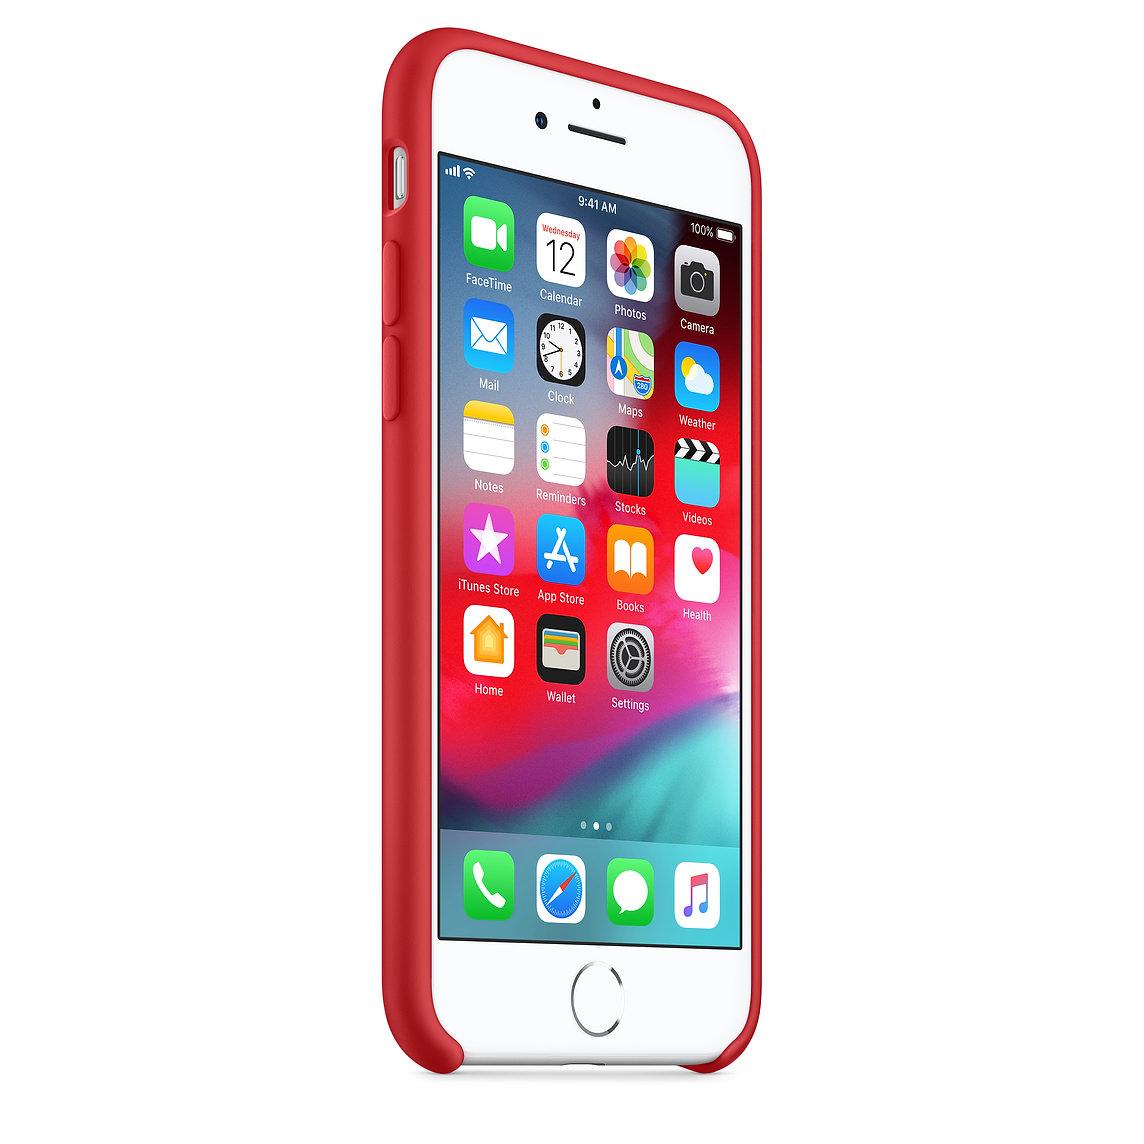 Apple silikónový obal pre iPhone SE 2020 - červený 2